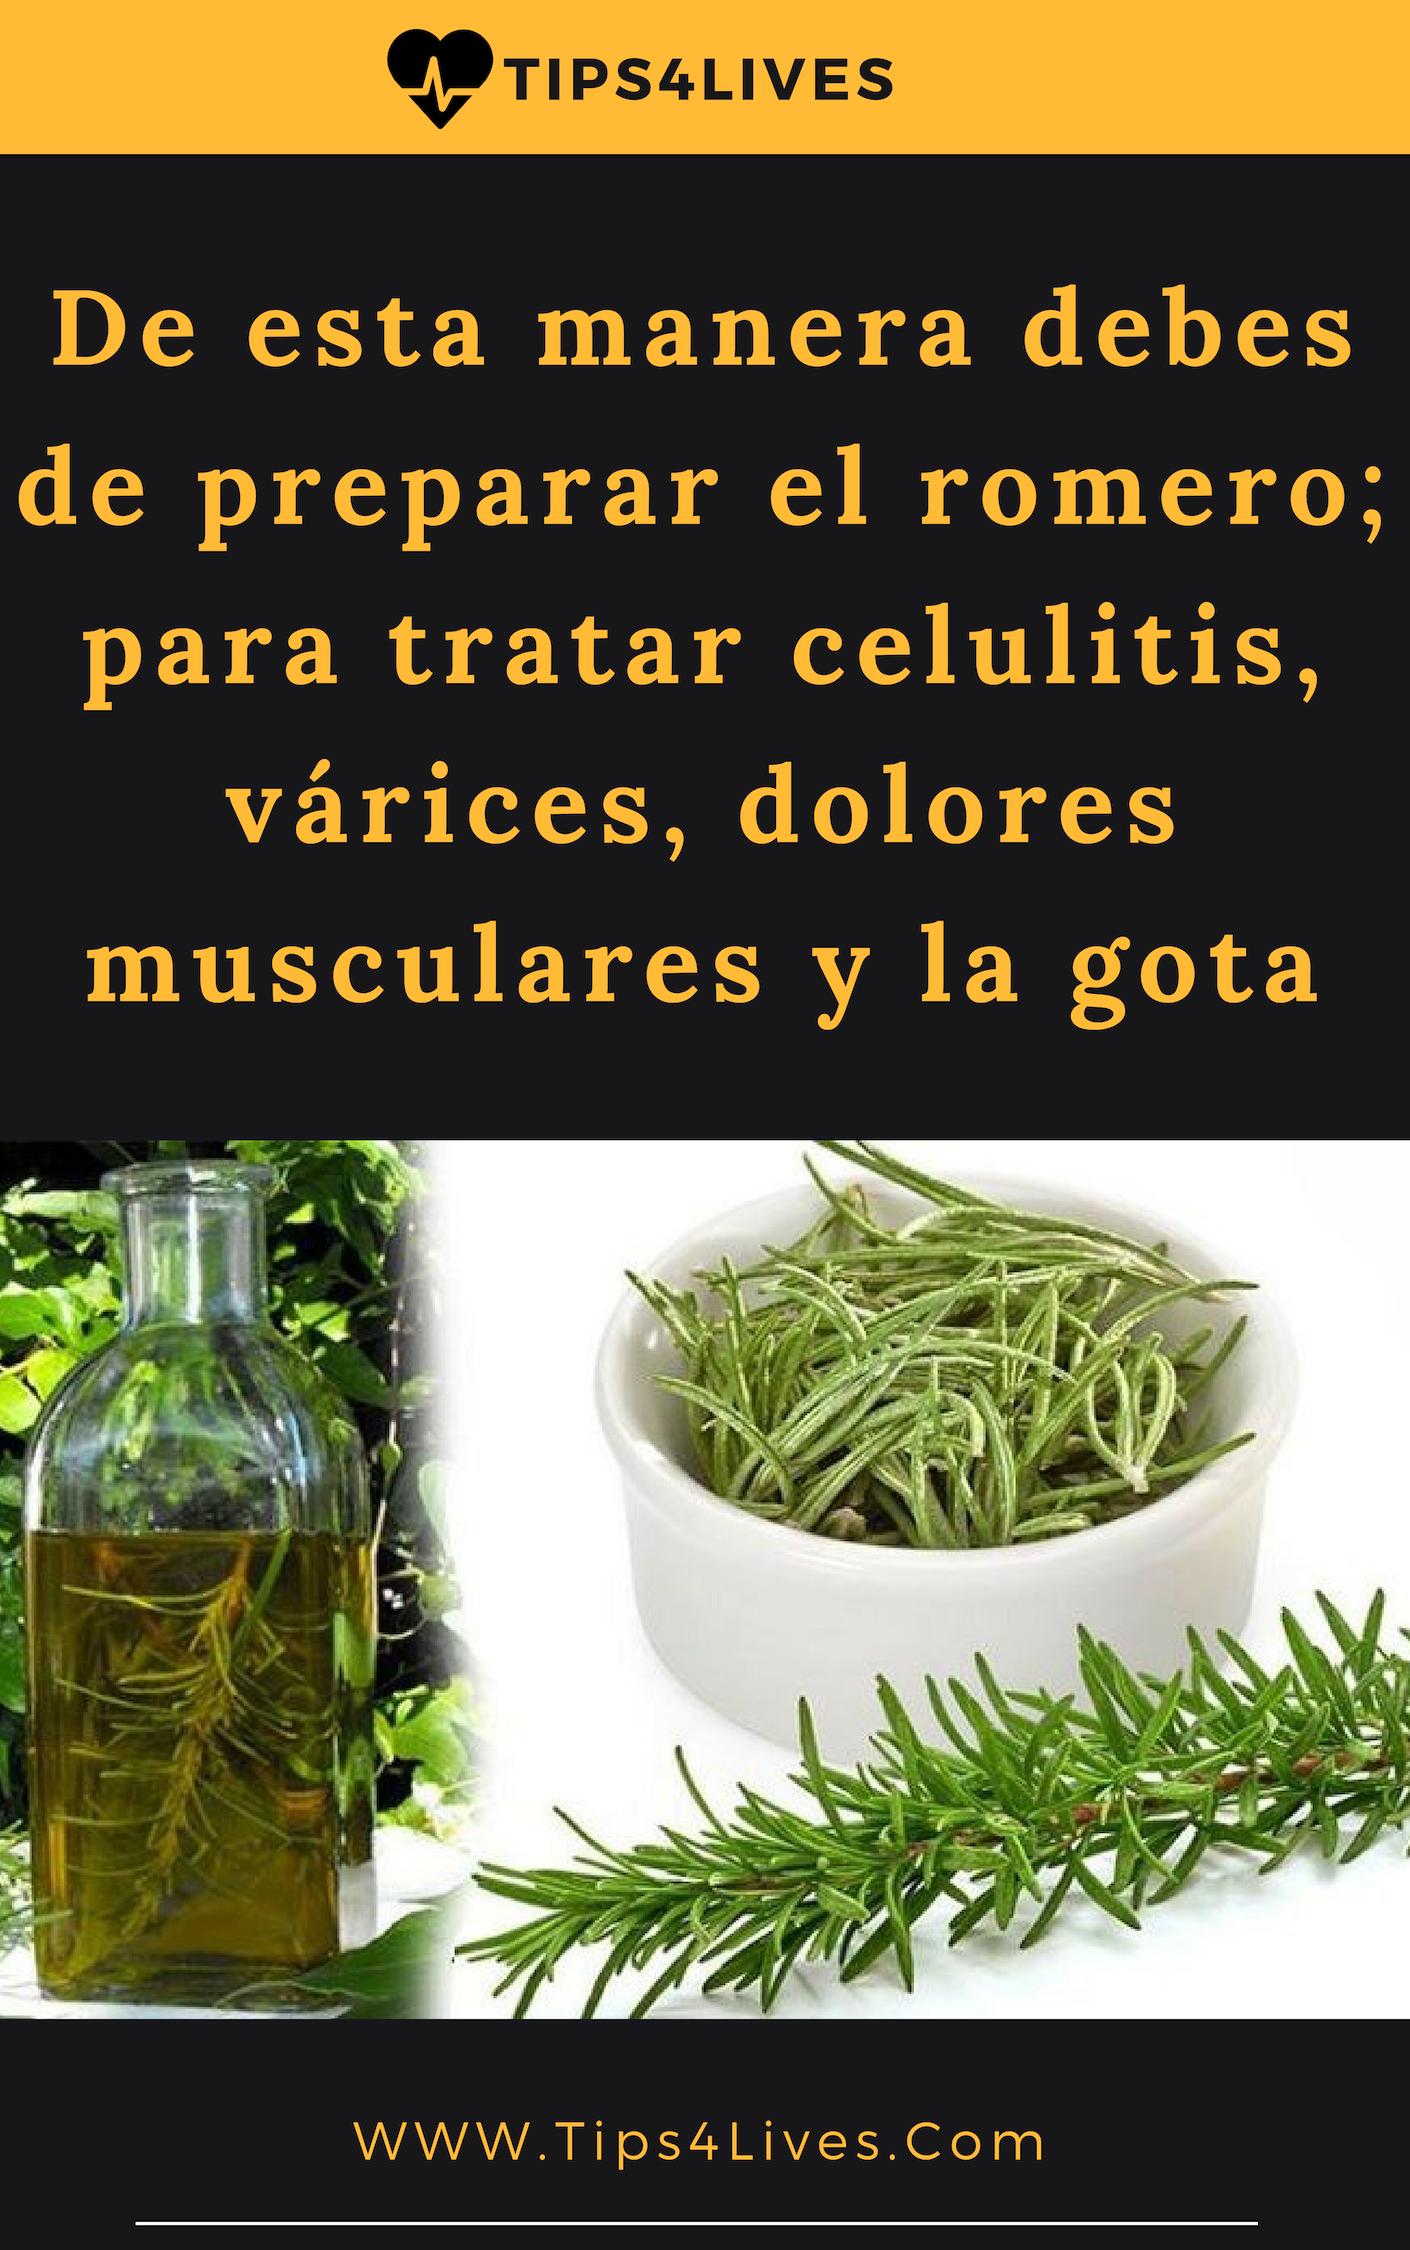 De Esta Manera Debes De Preparar El Romero Para Tratar Celulitis Várices Dolores Musculares Remedies Natural Health Remedies Natural Medicine